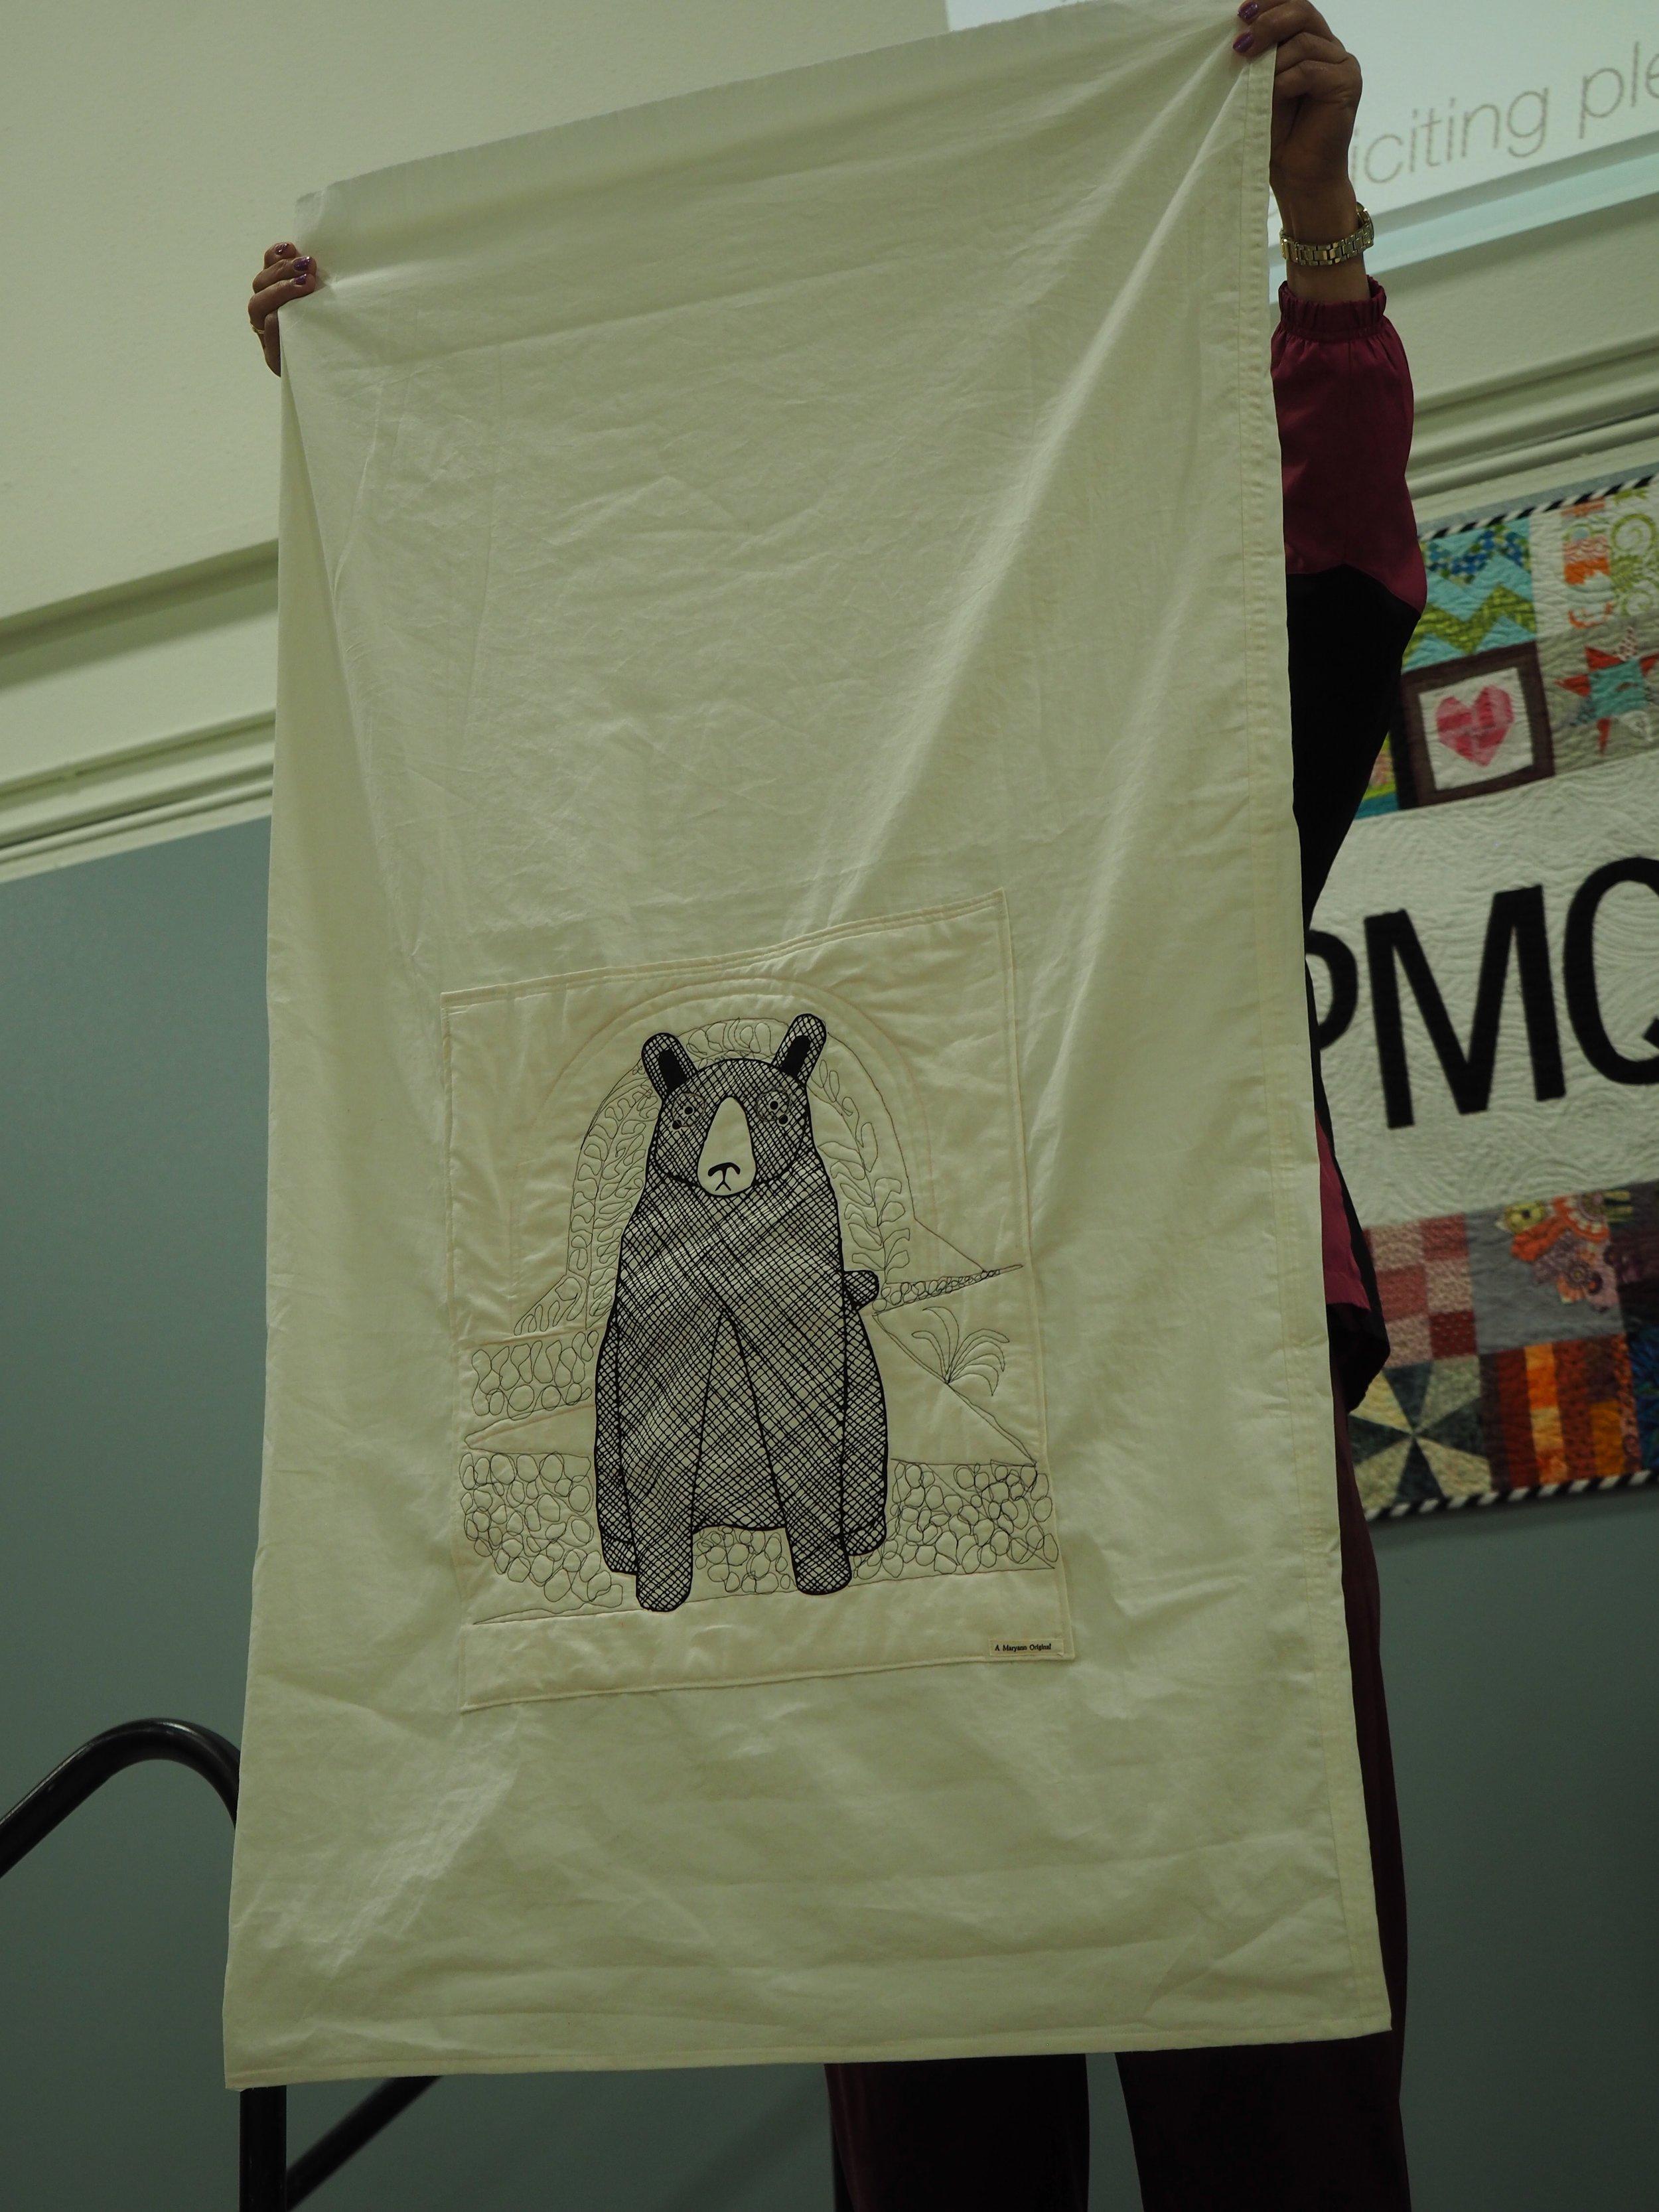 Toddler Sleeping bag by Maryann Todd-Thompson